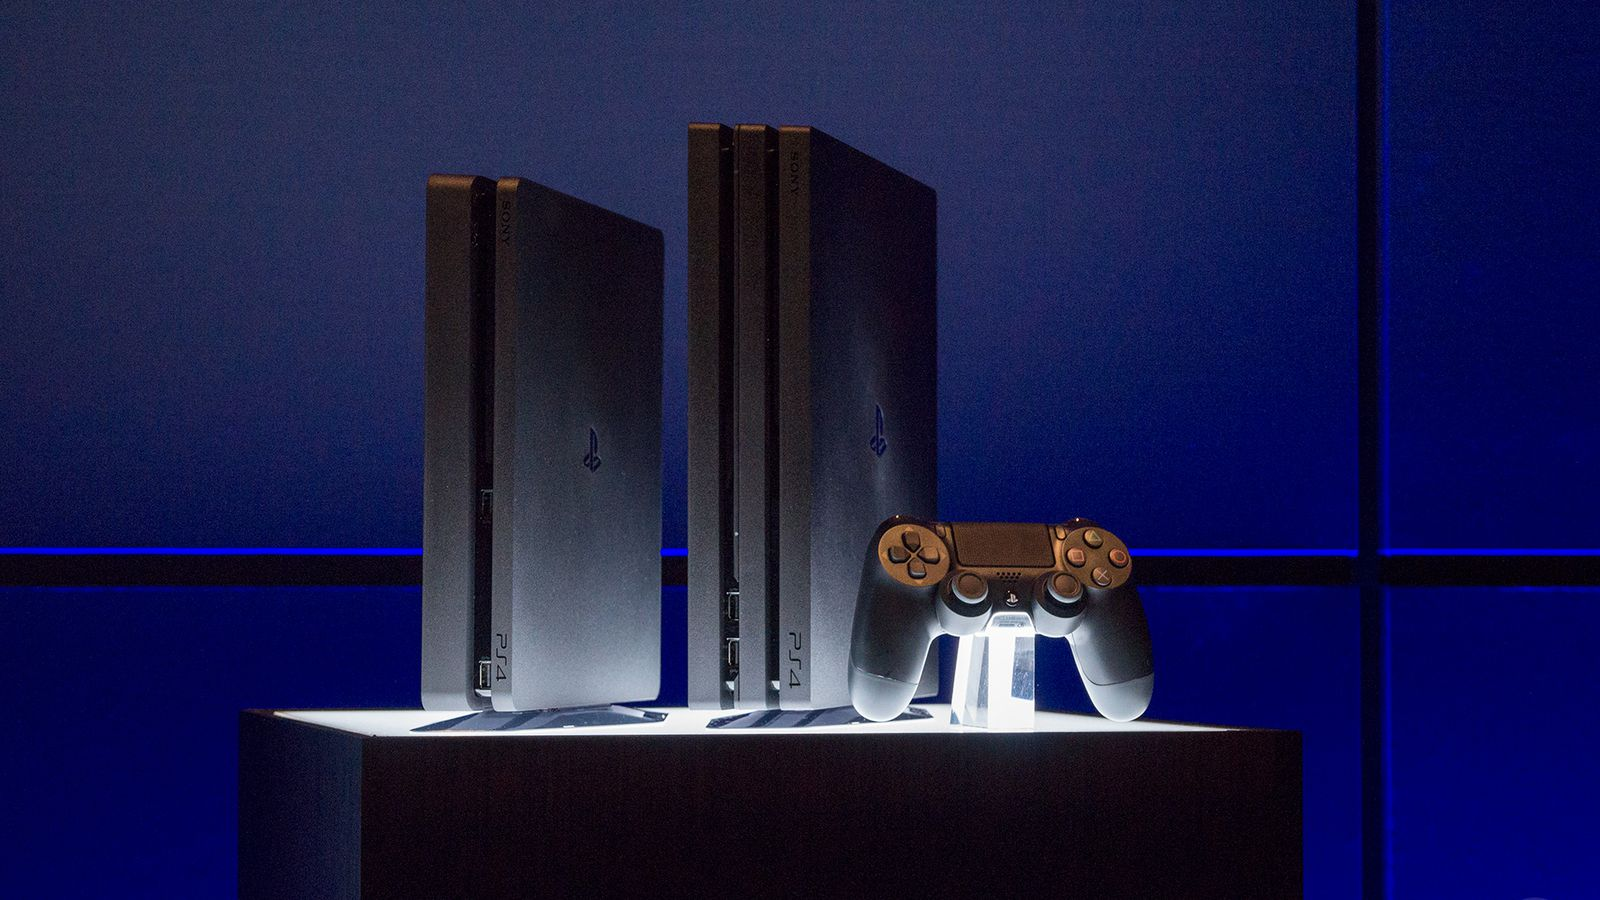 PS4 shipments reach 60 million units worldwide